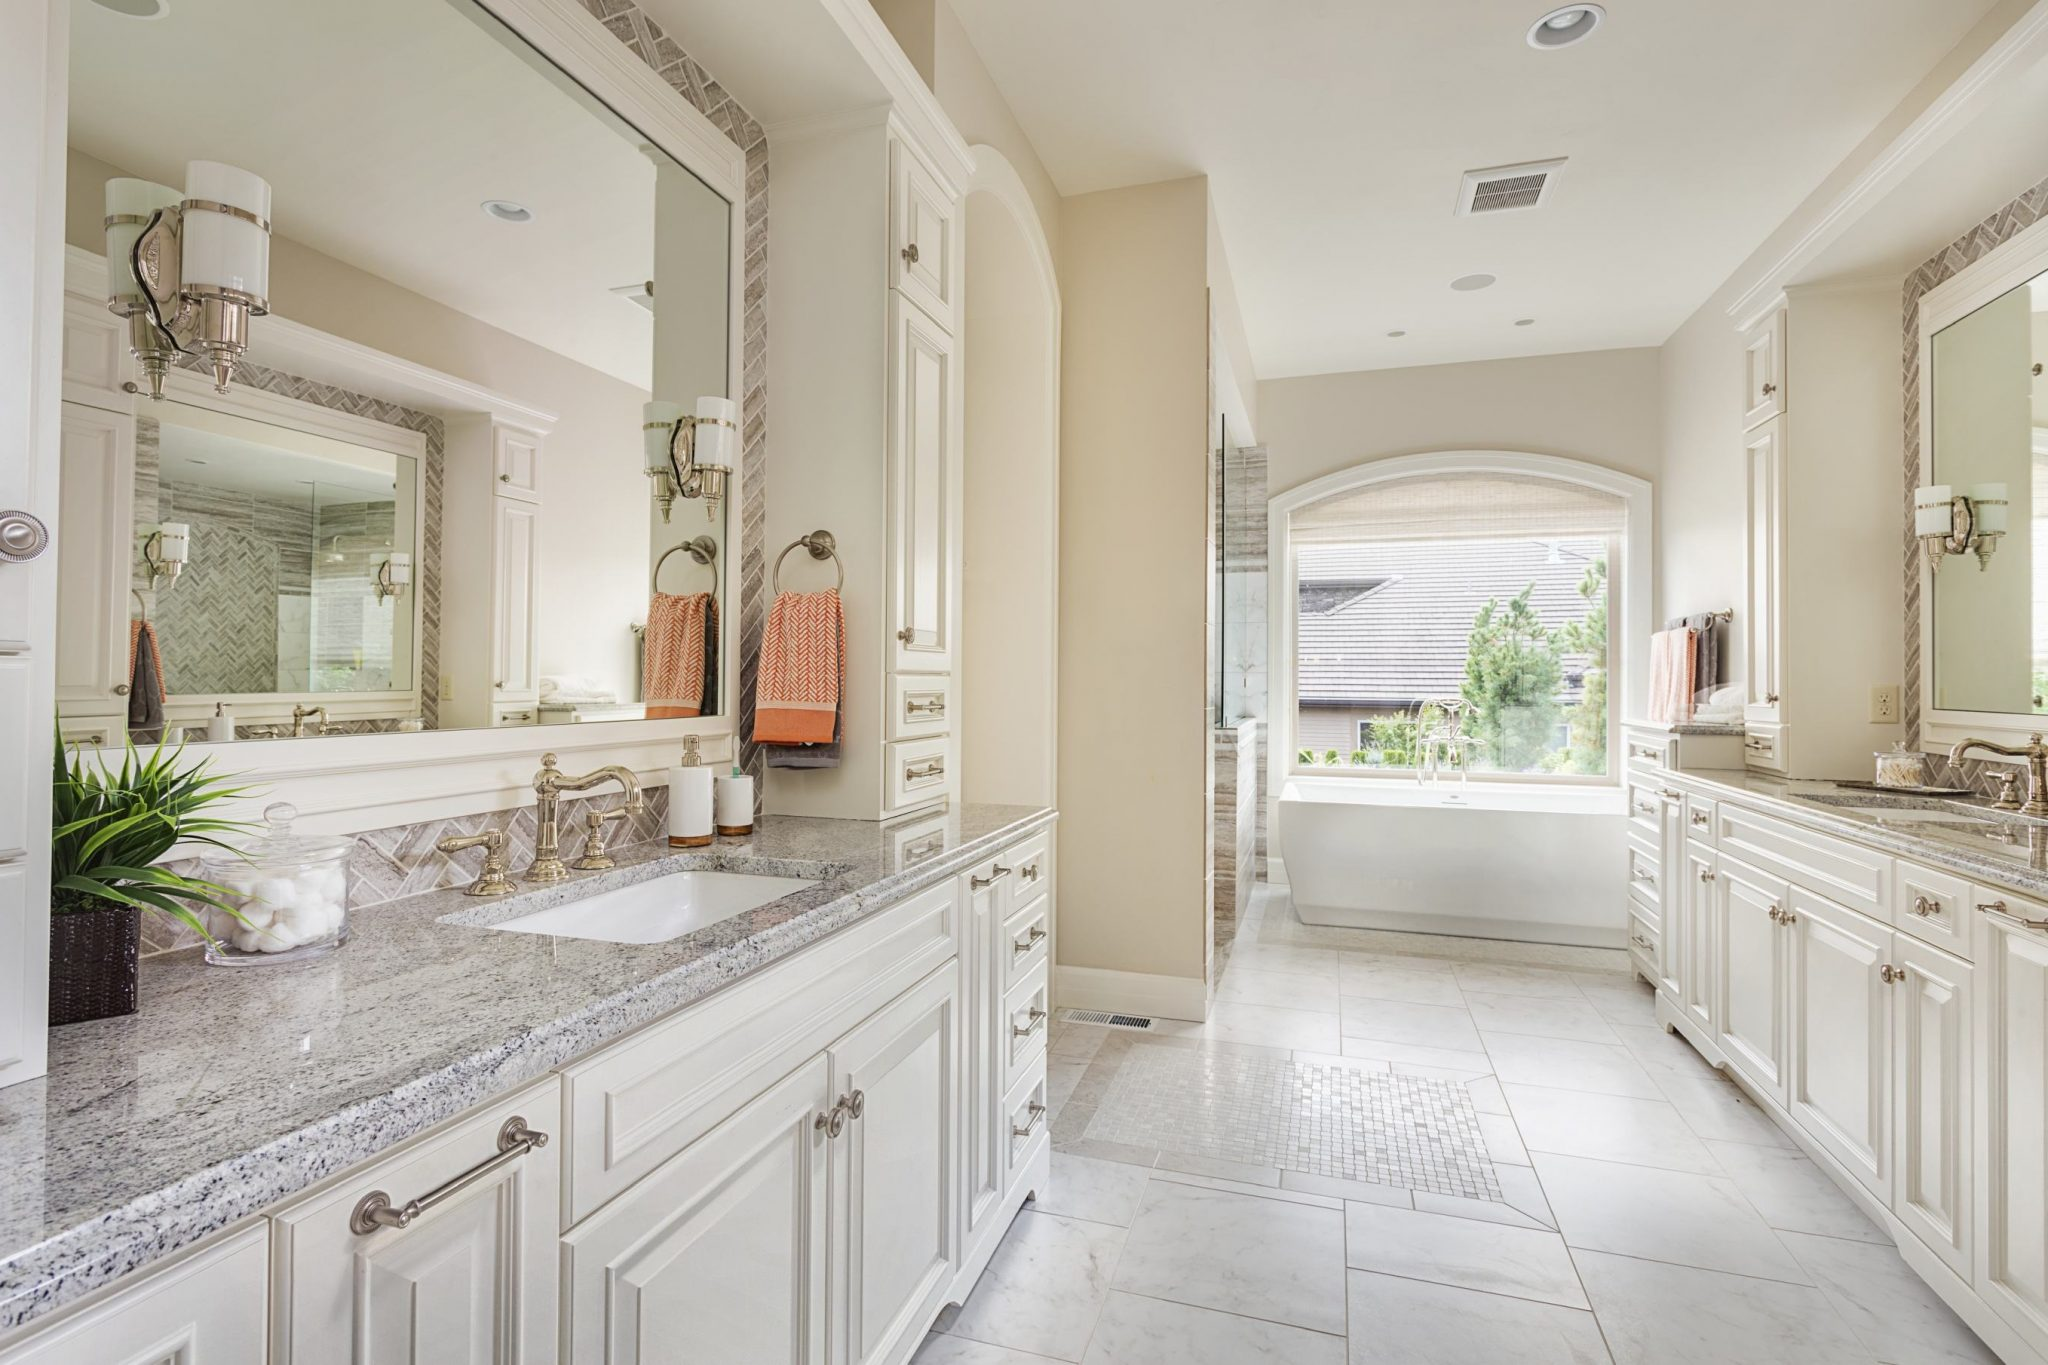 Bathroom Cabinets Replacement Unique Builders